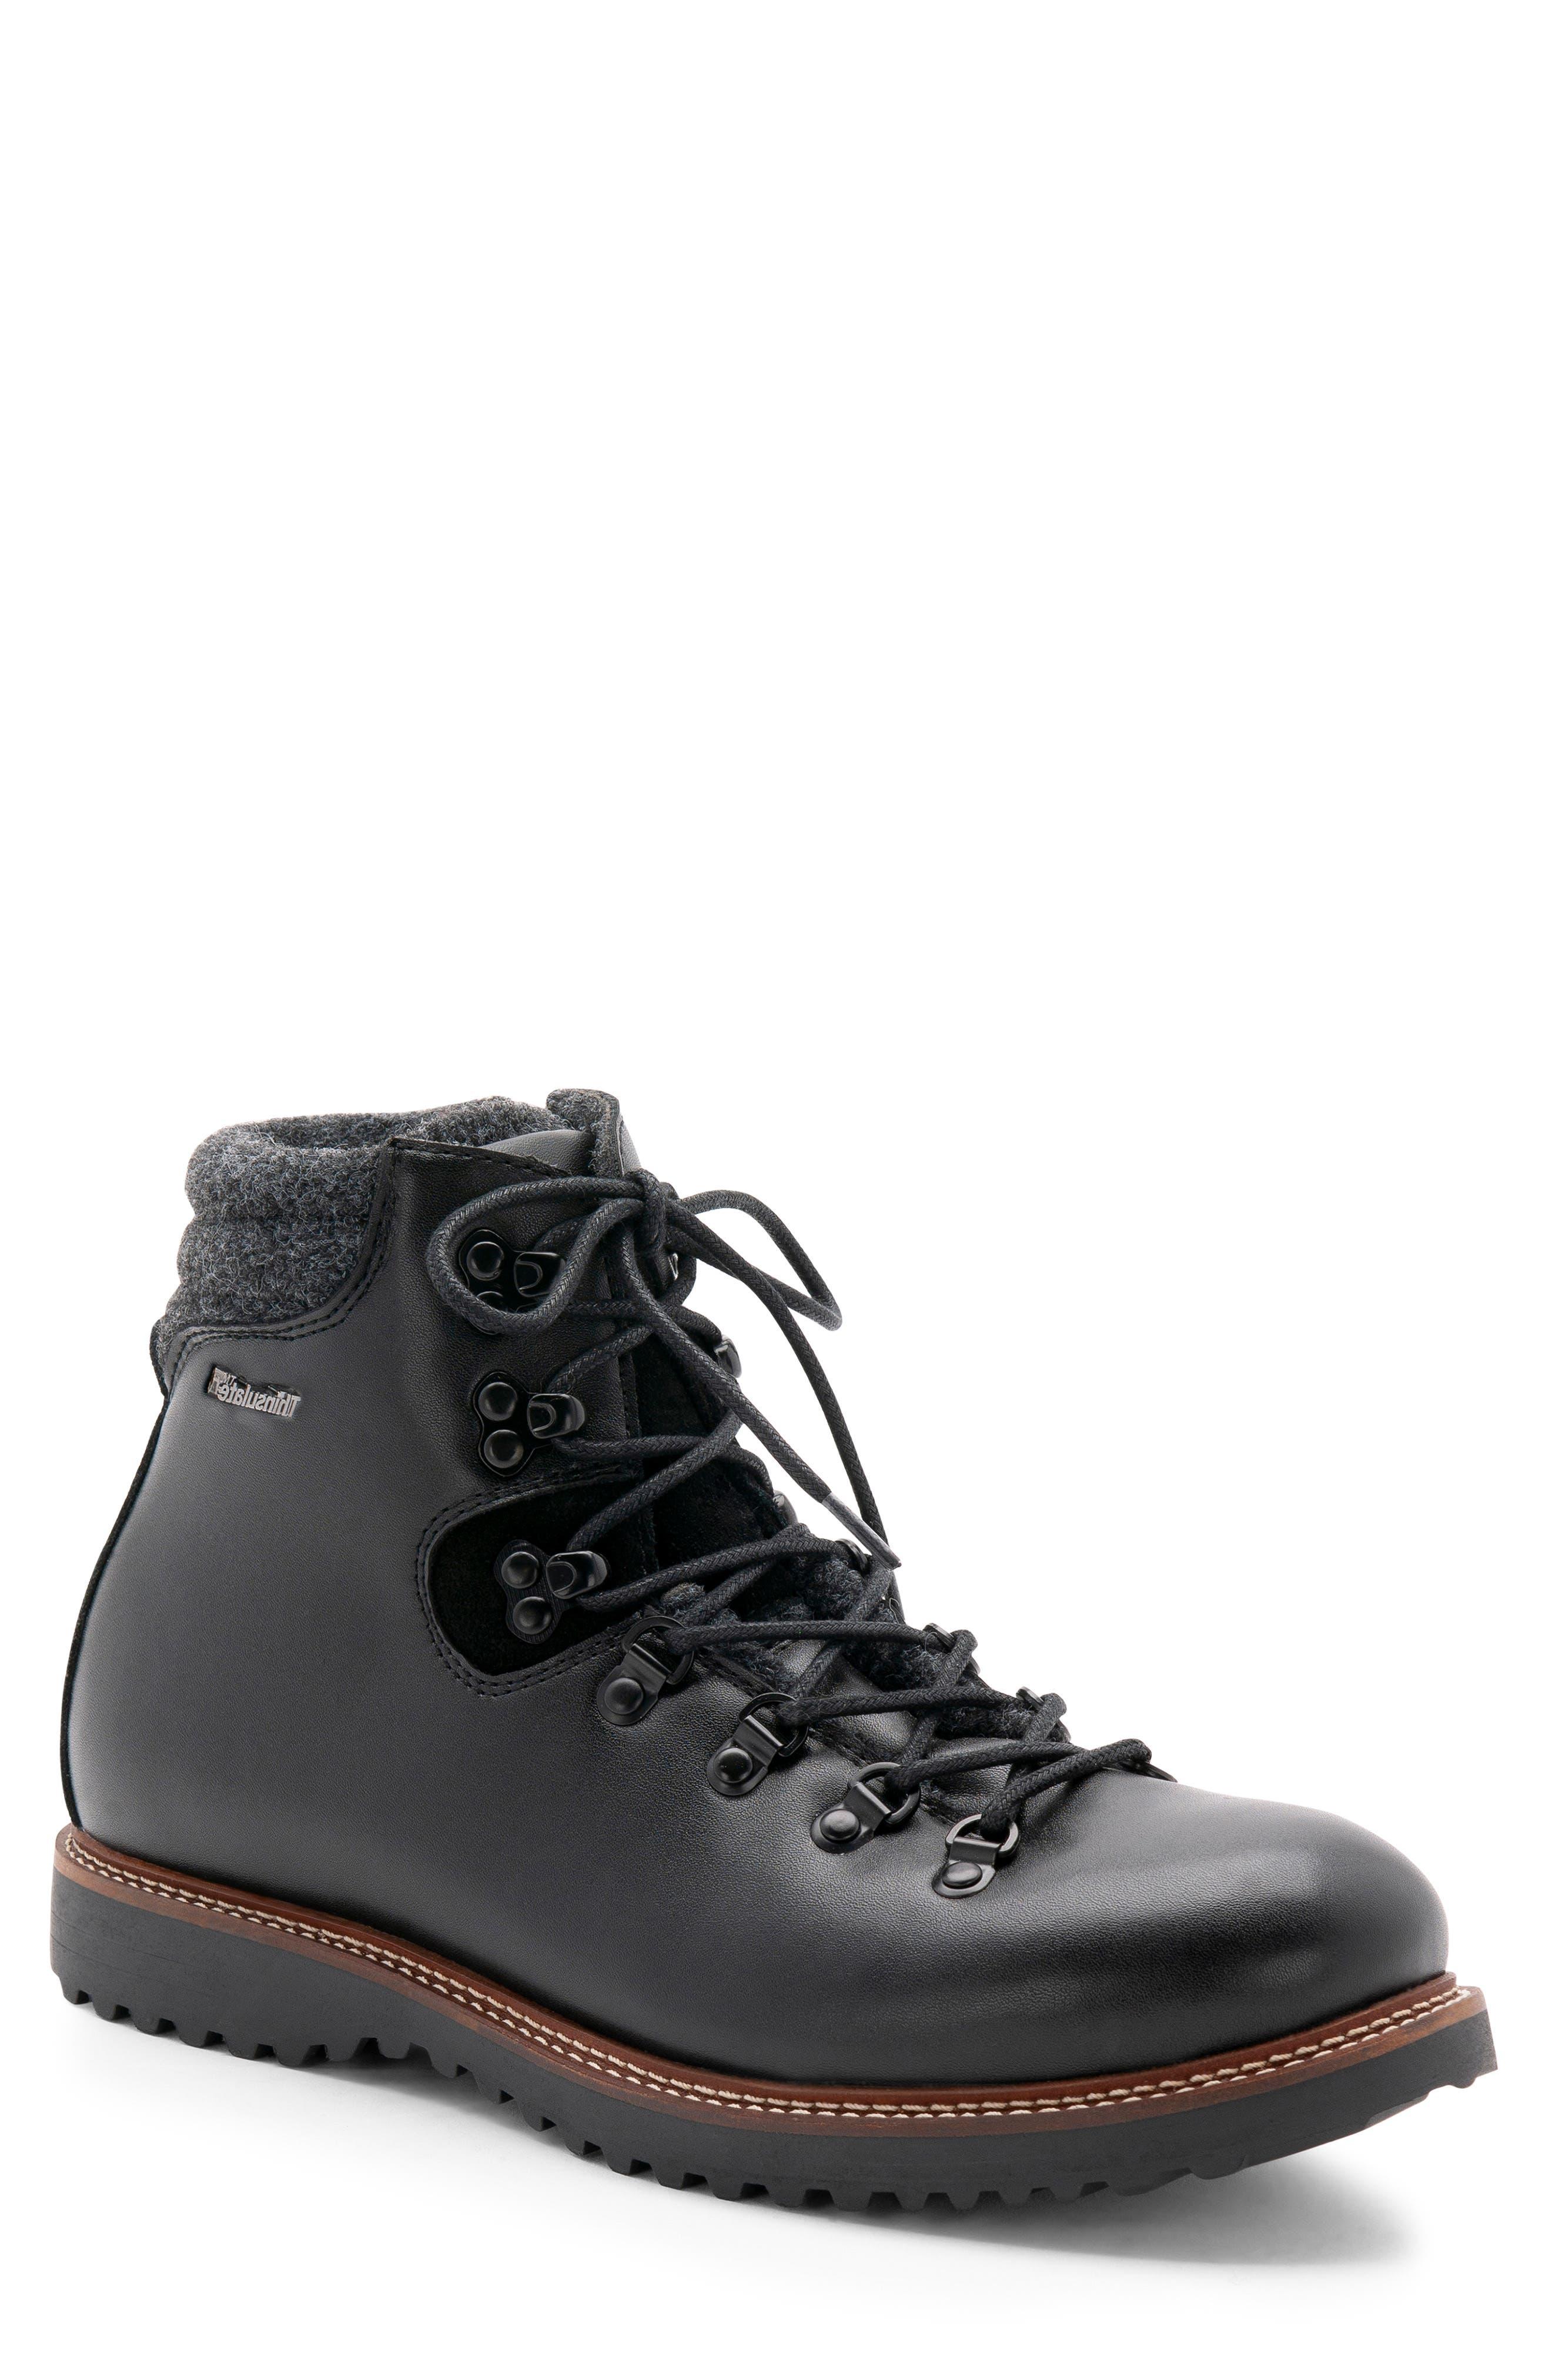 BLONDO, Morgan Waterproof Plain Toe Boot, Main thumbnail 1, color, BLACK LEATHER